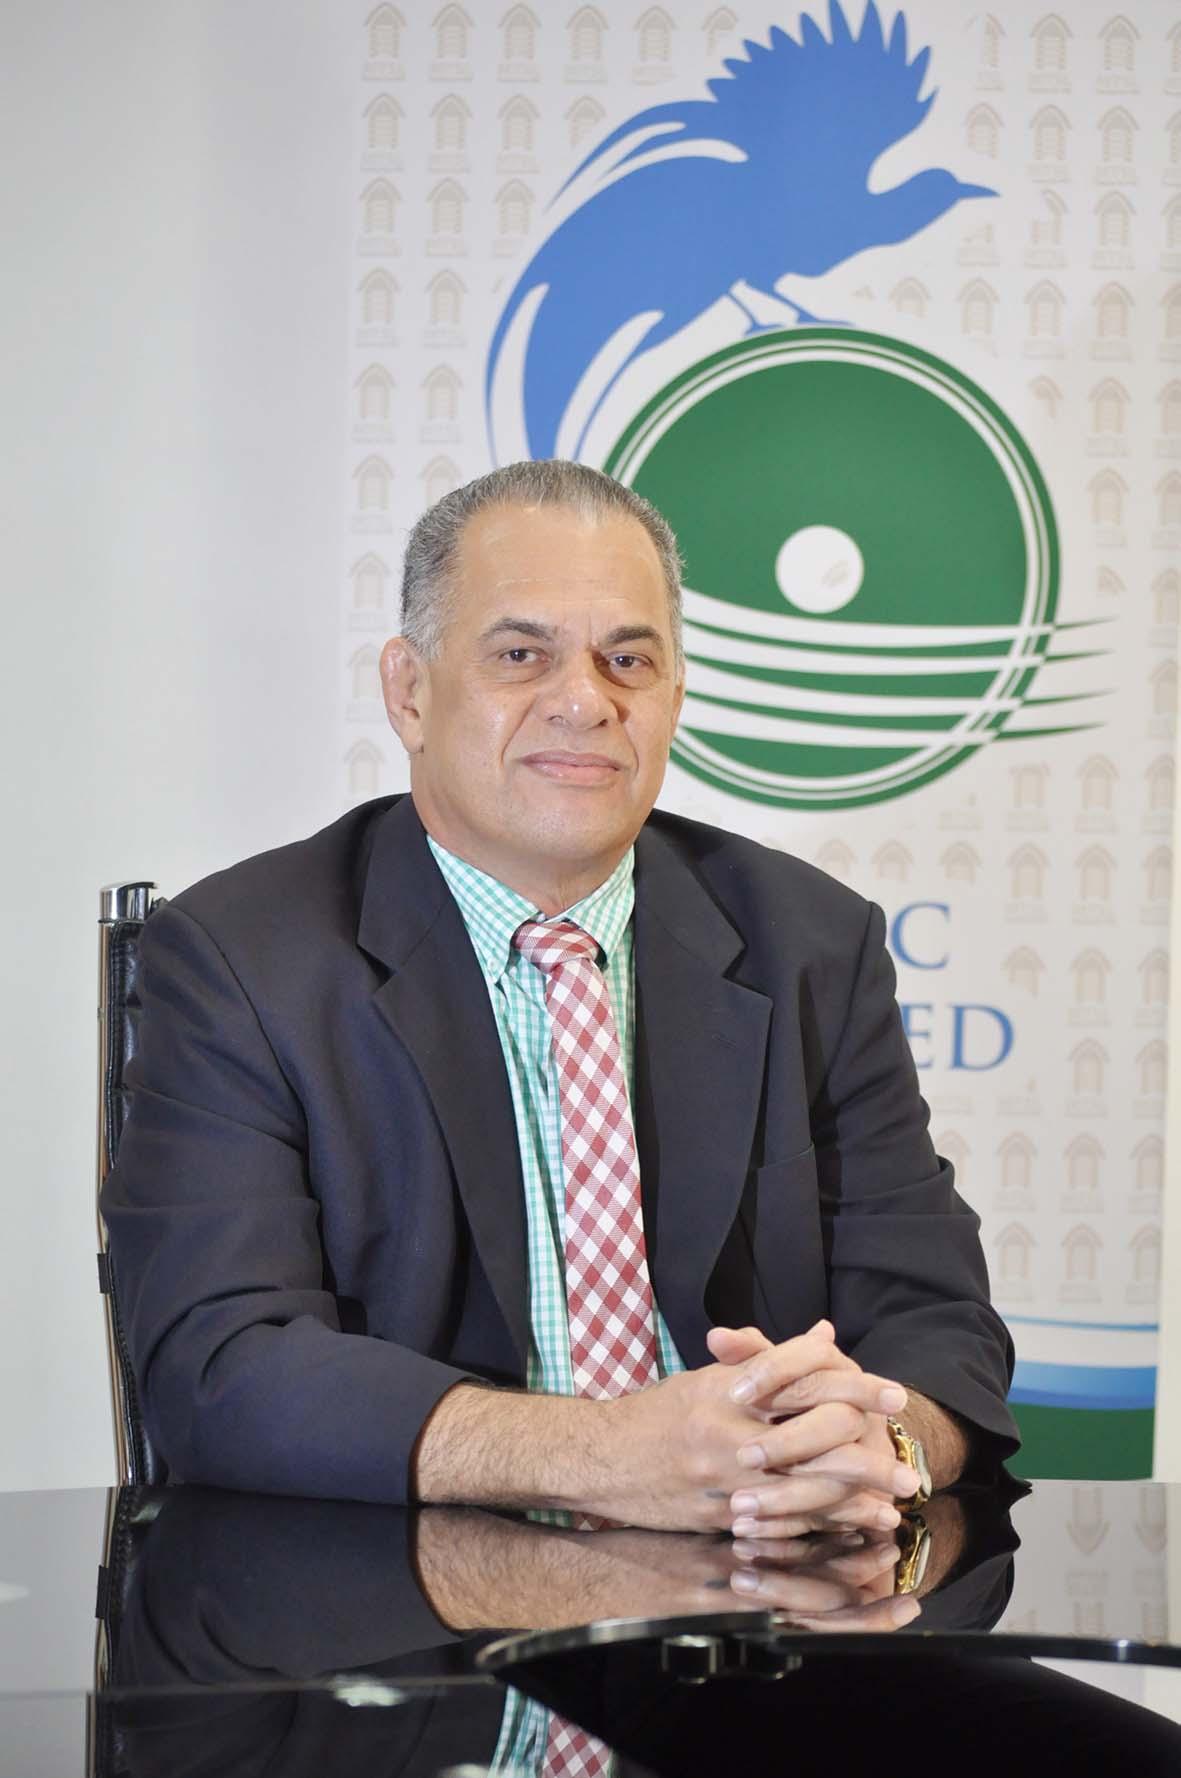 Executive Chairman - John Sanday